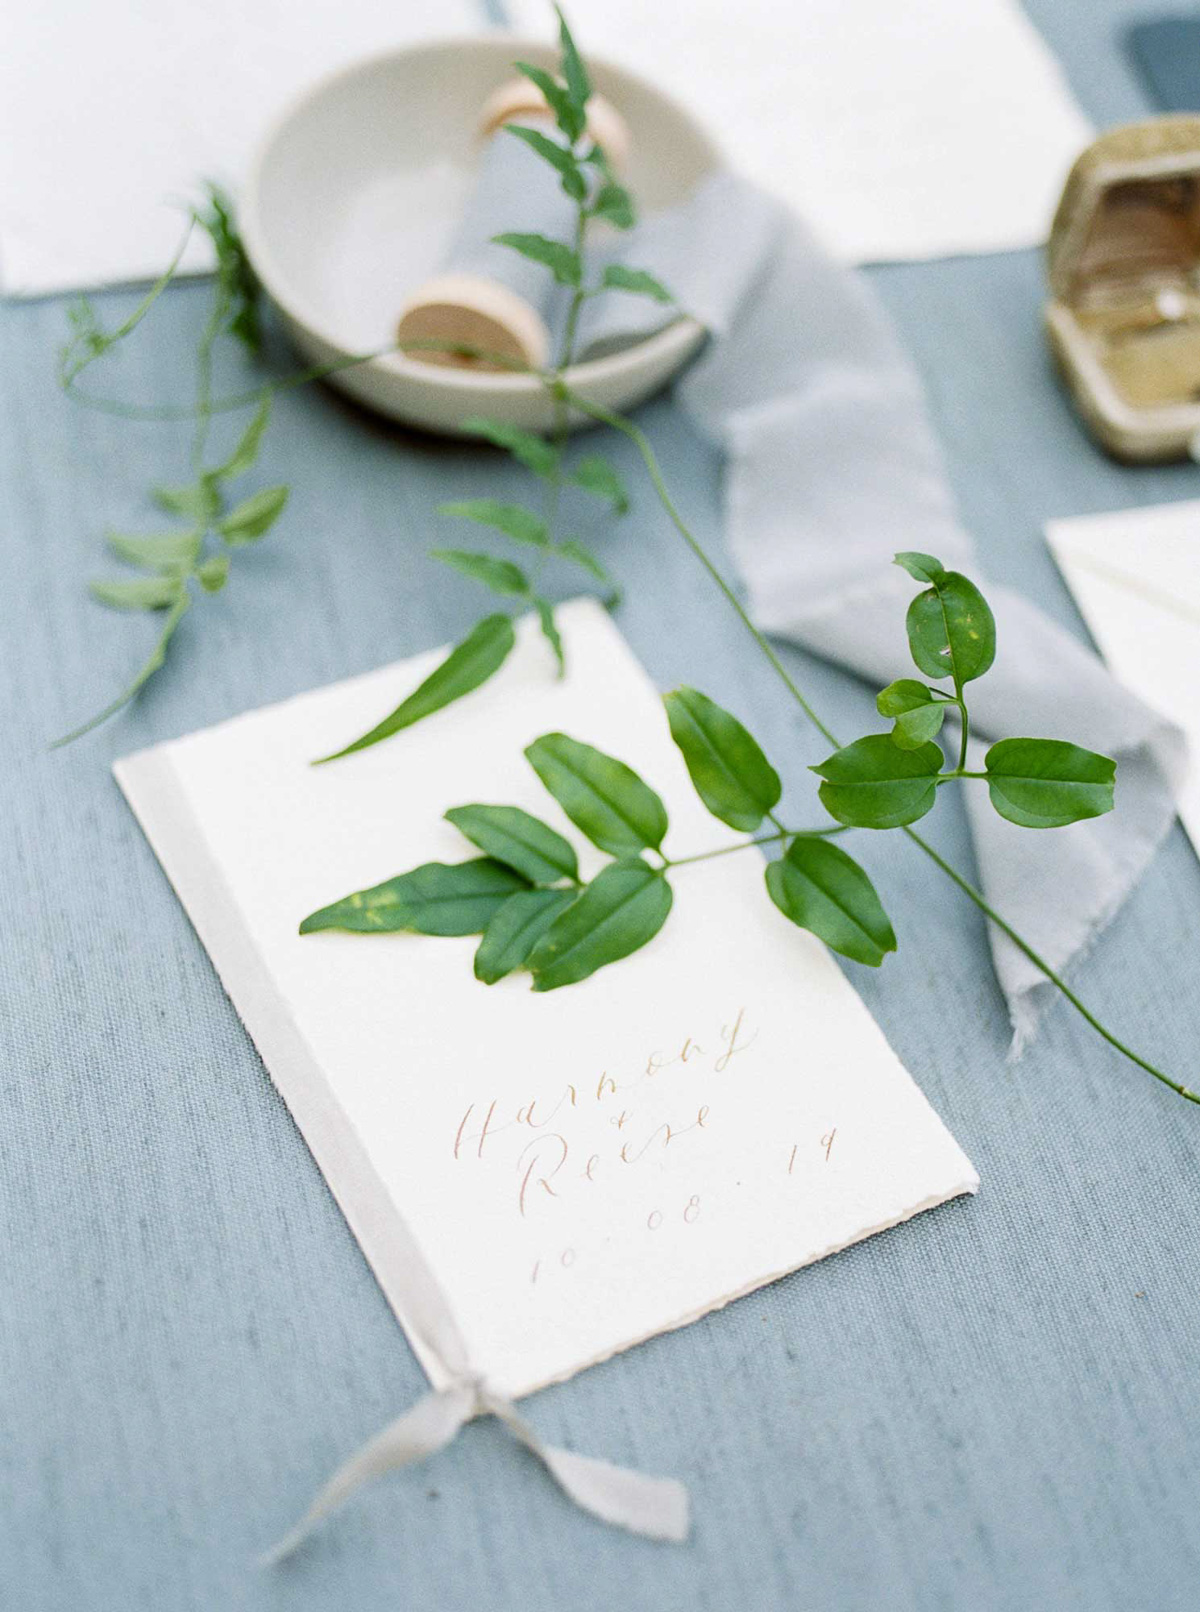 kayla-yestal-vineyard-bride-swish-list-woodland-weddings-niagara-wedding-editorial-7.jpg